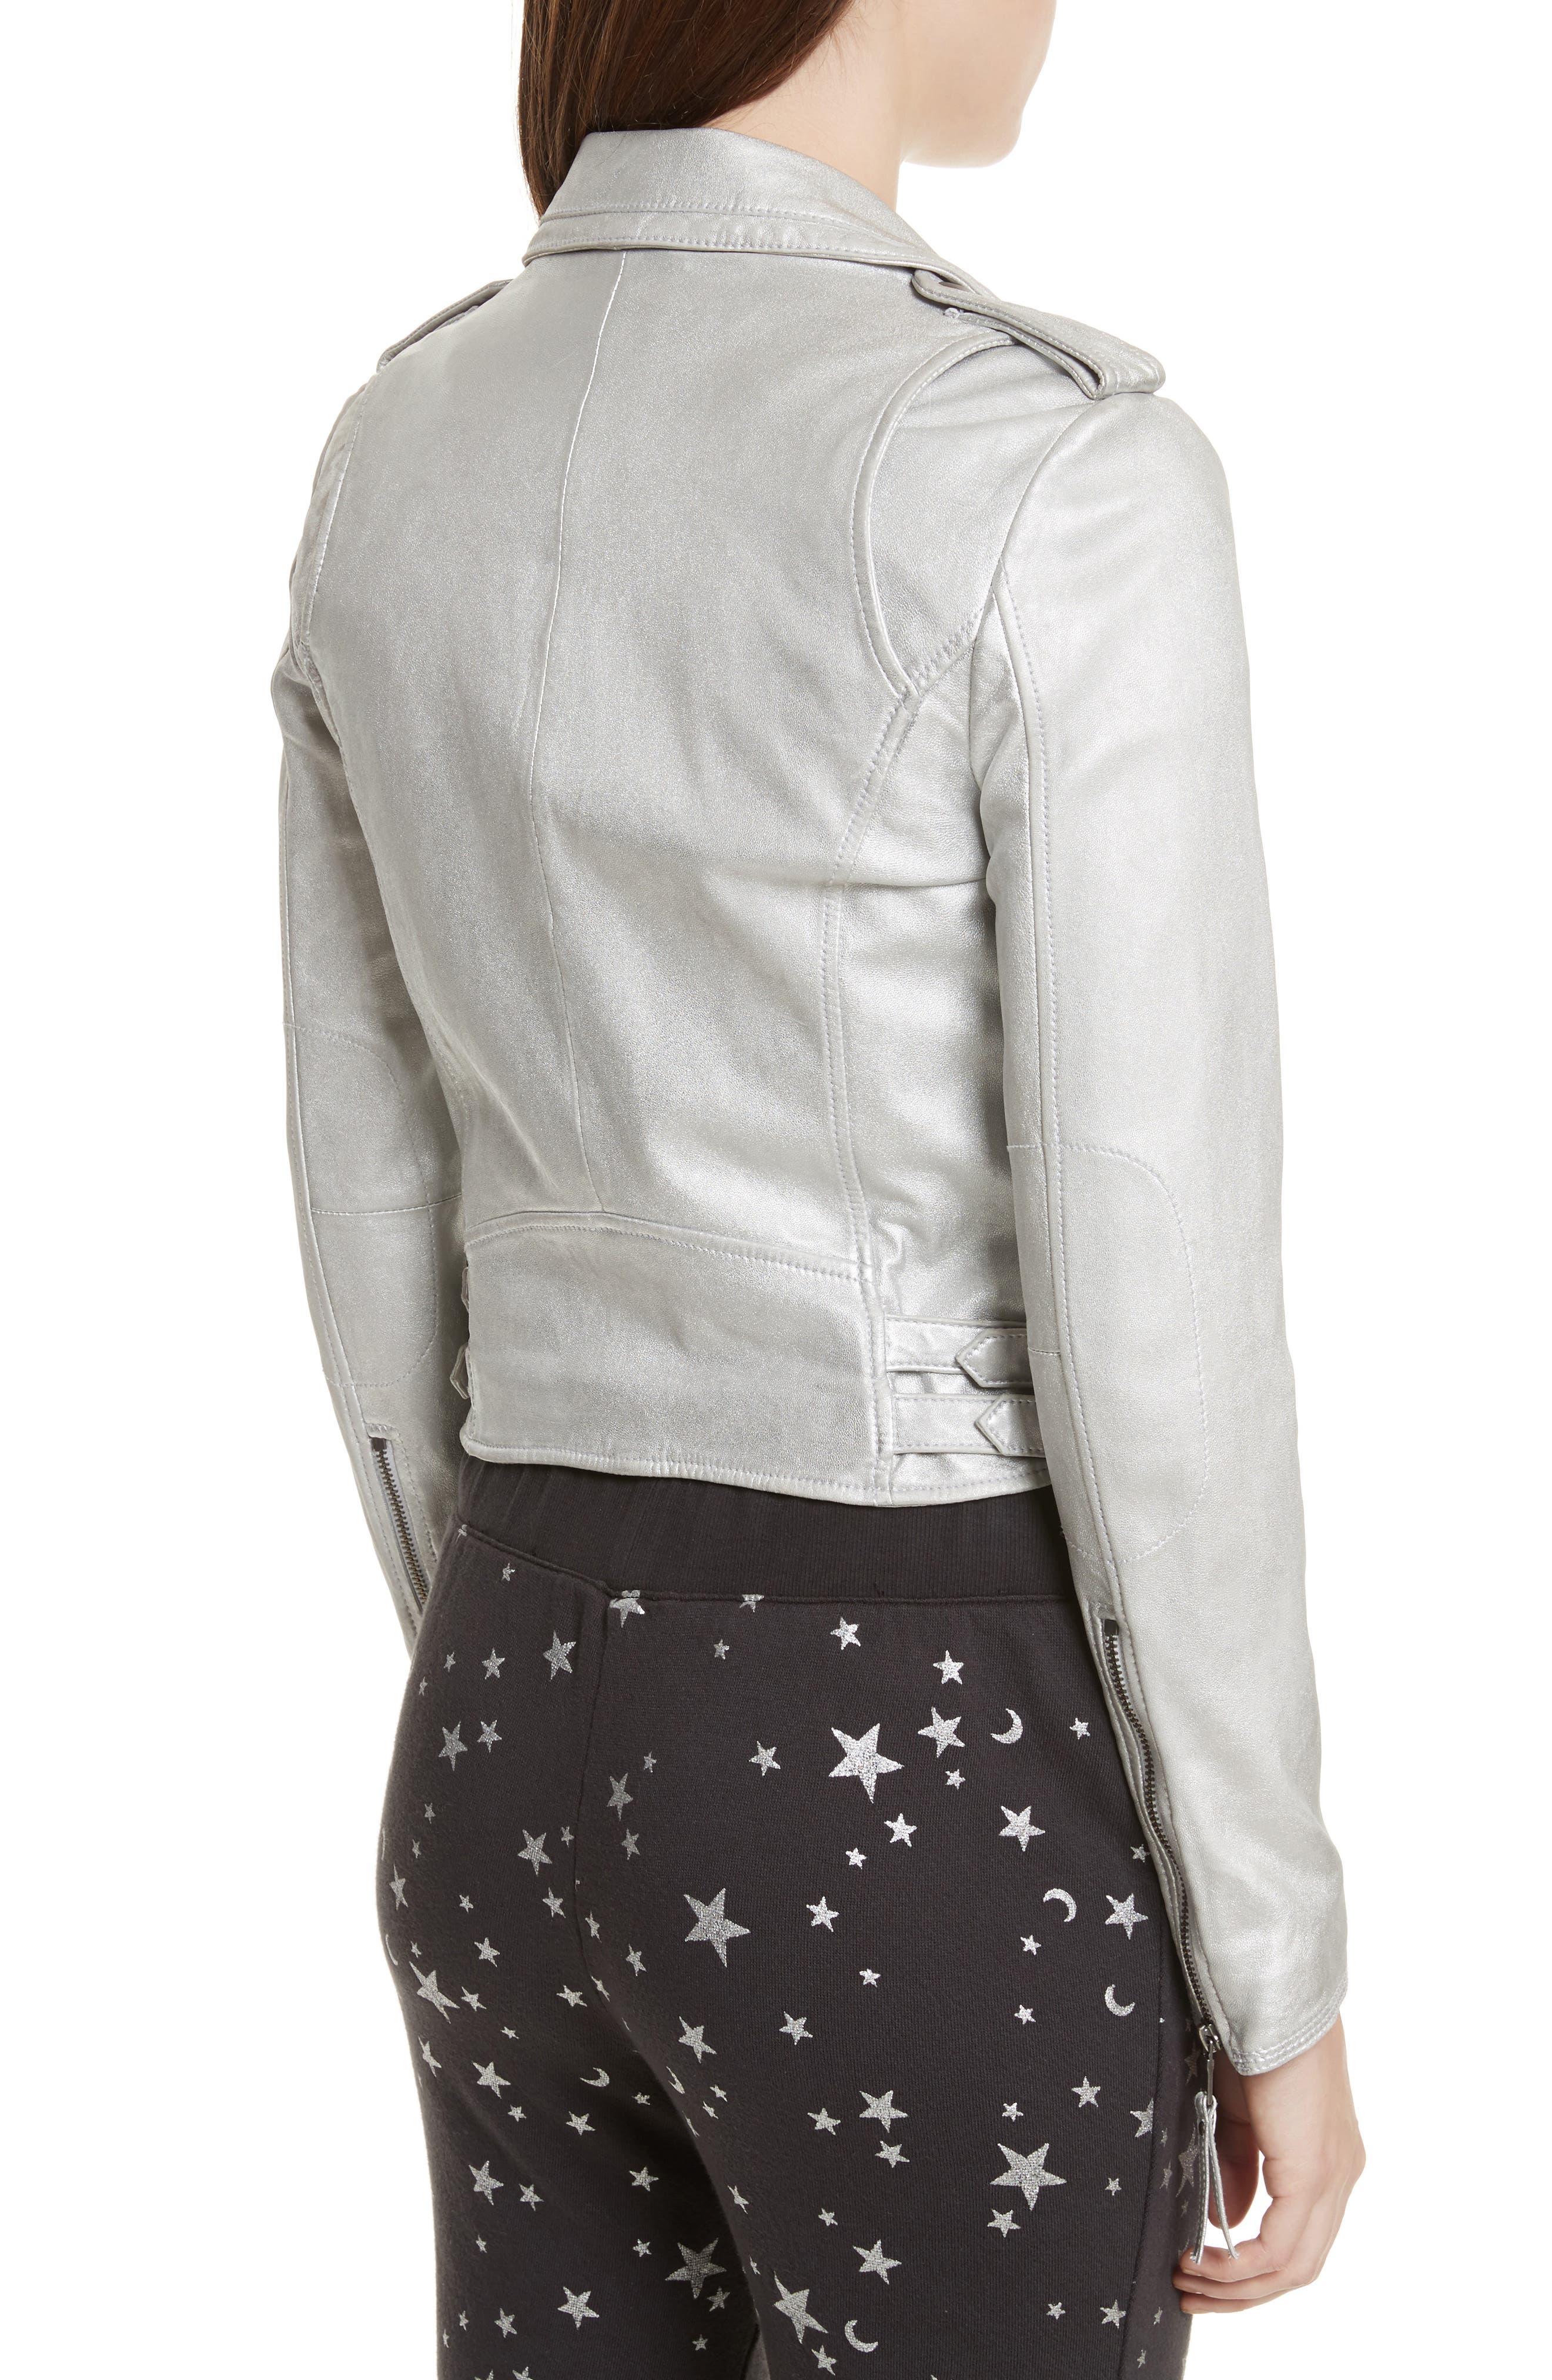 Leolani Leather Jacket,                             Alternate thumbnail 3, color,